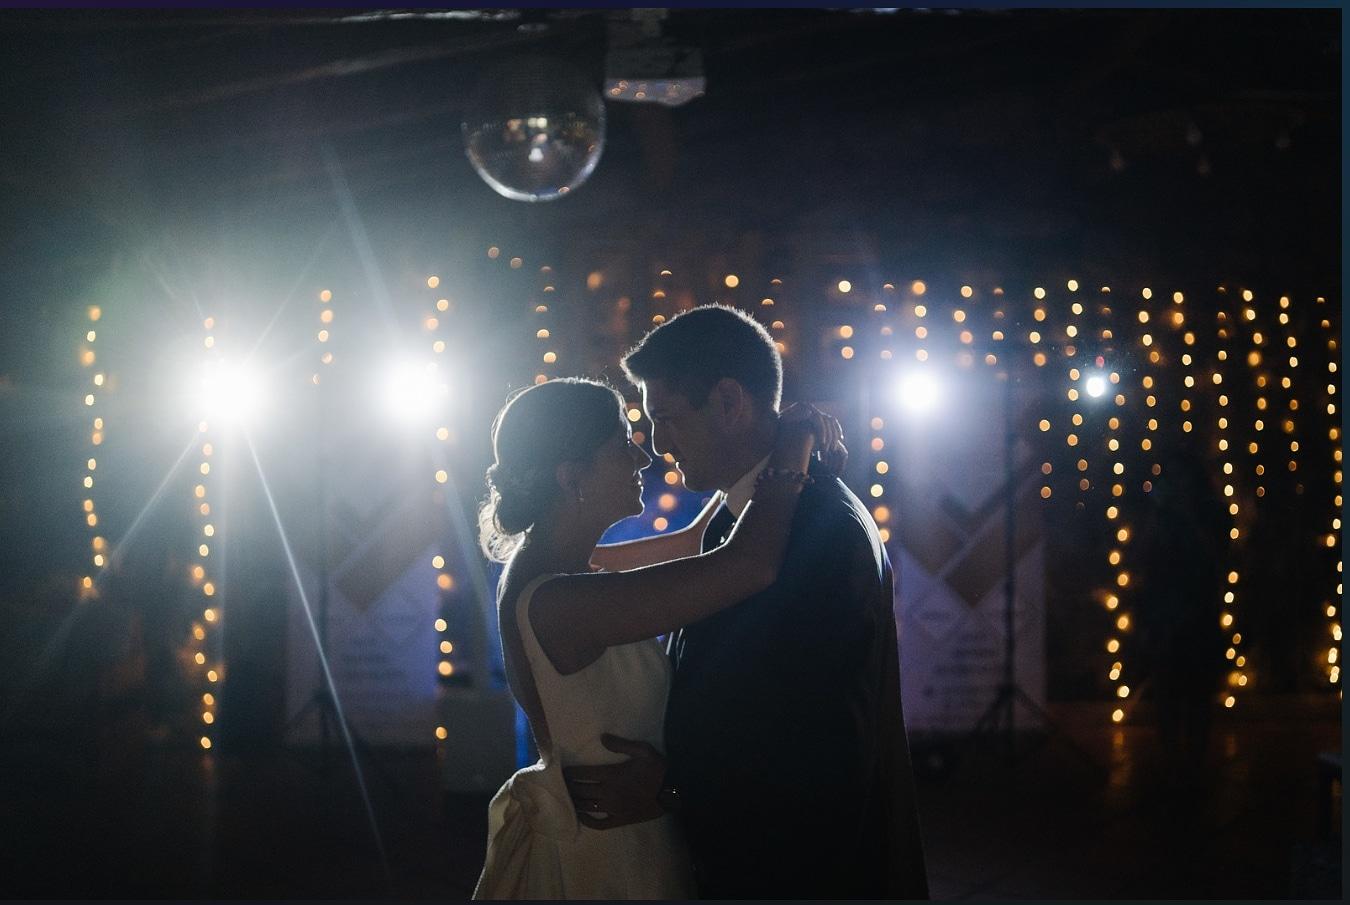 Música y djs para bodas 2gether Events